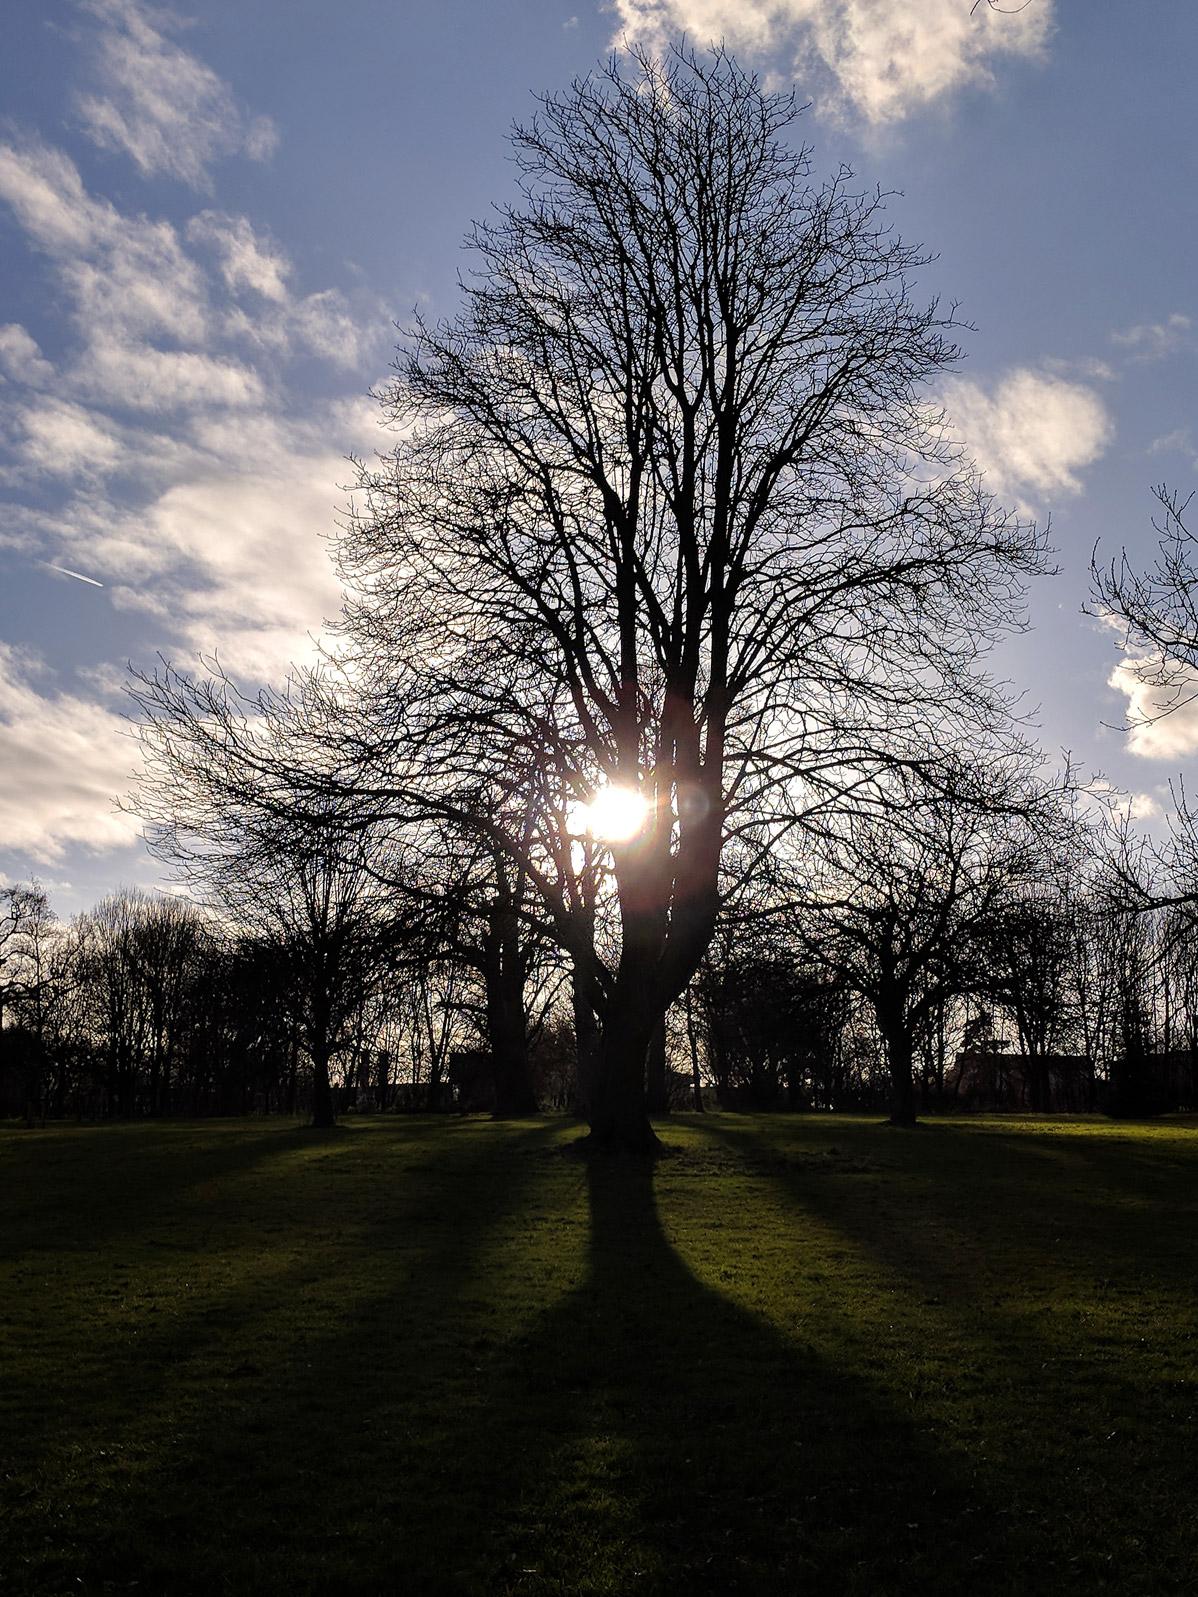 newborn-photography-hemel-hempstead-sunset-tree.jpg